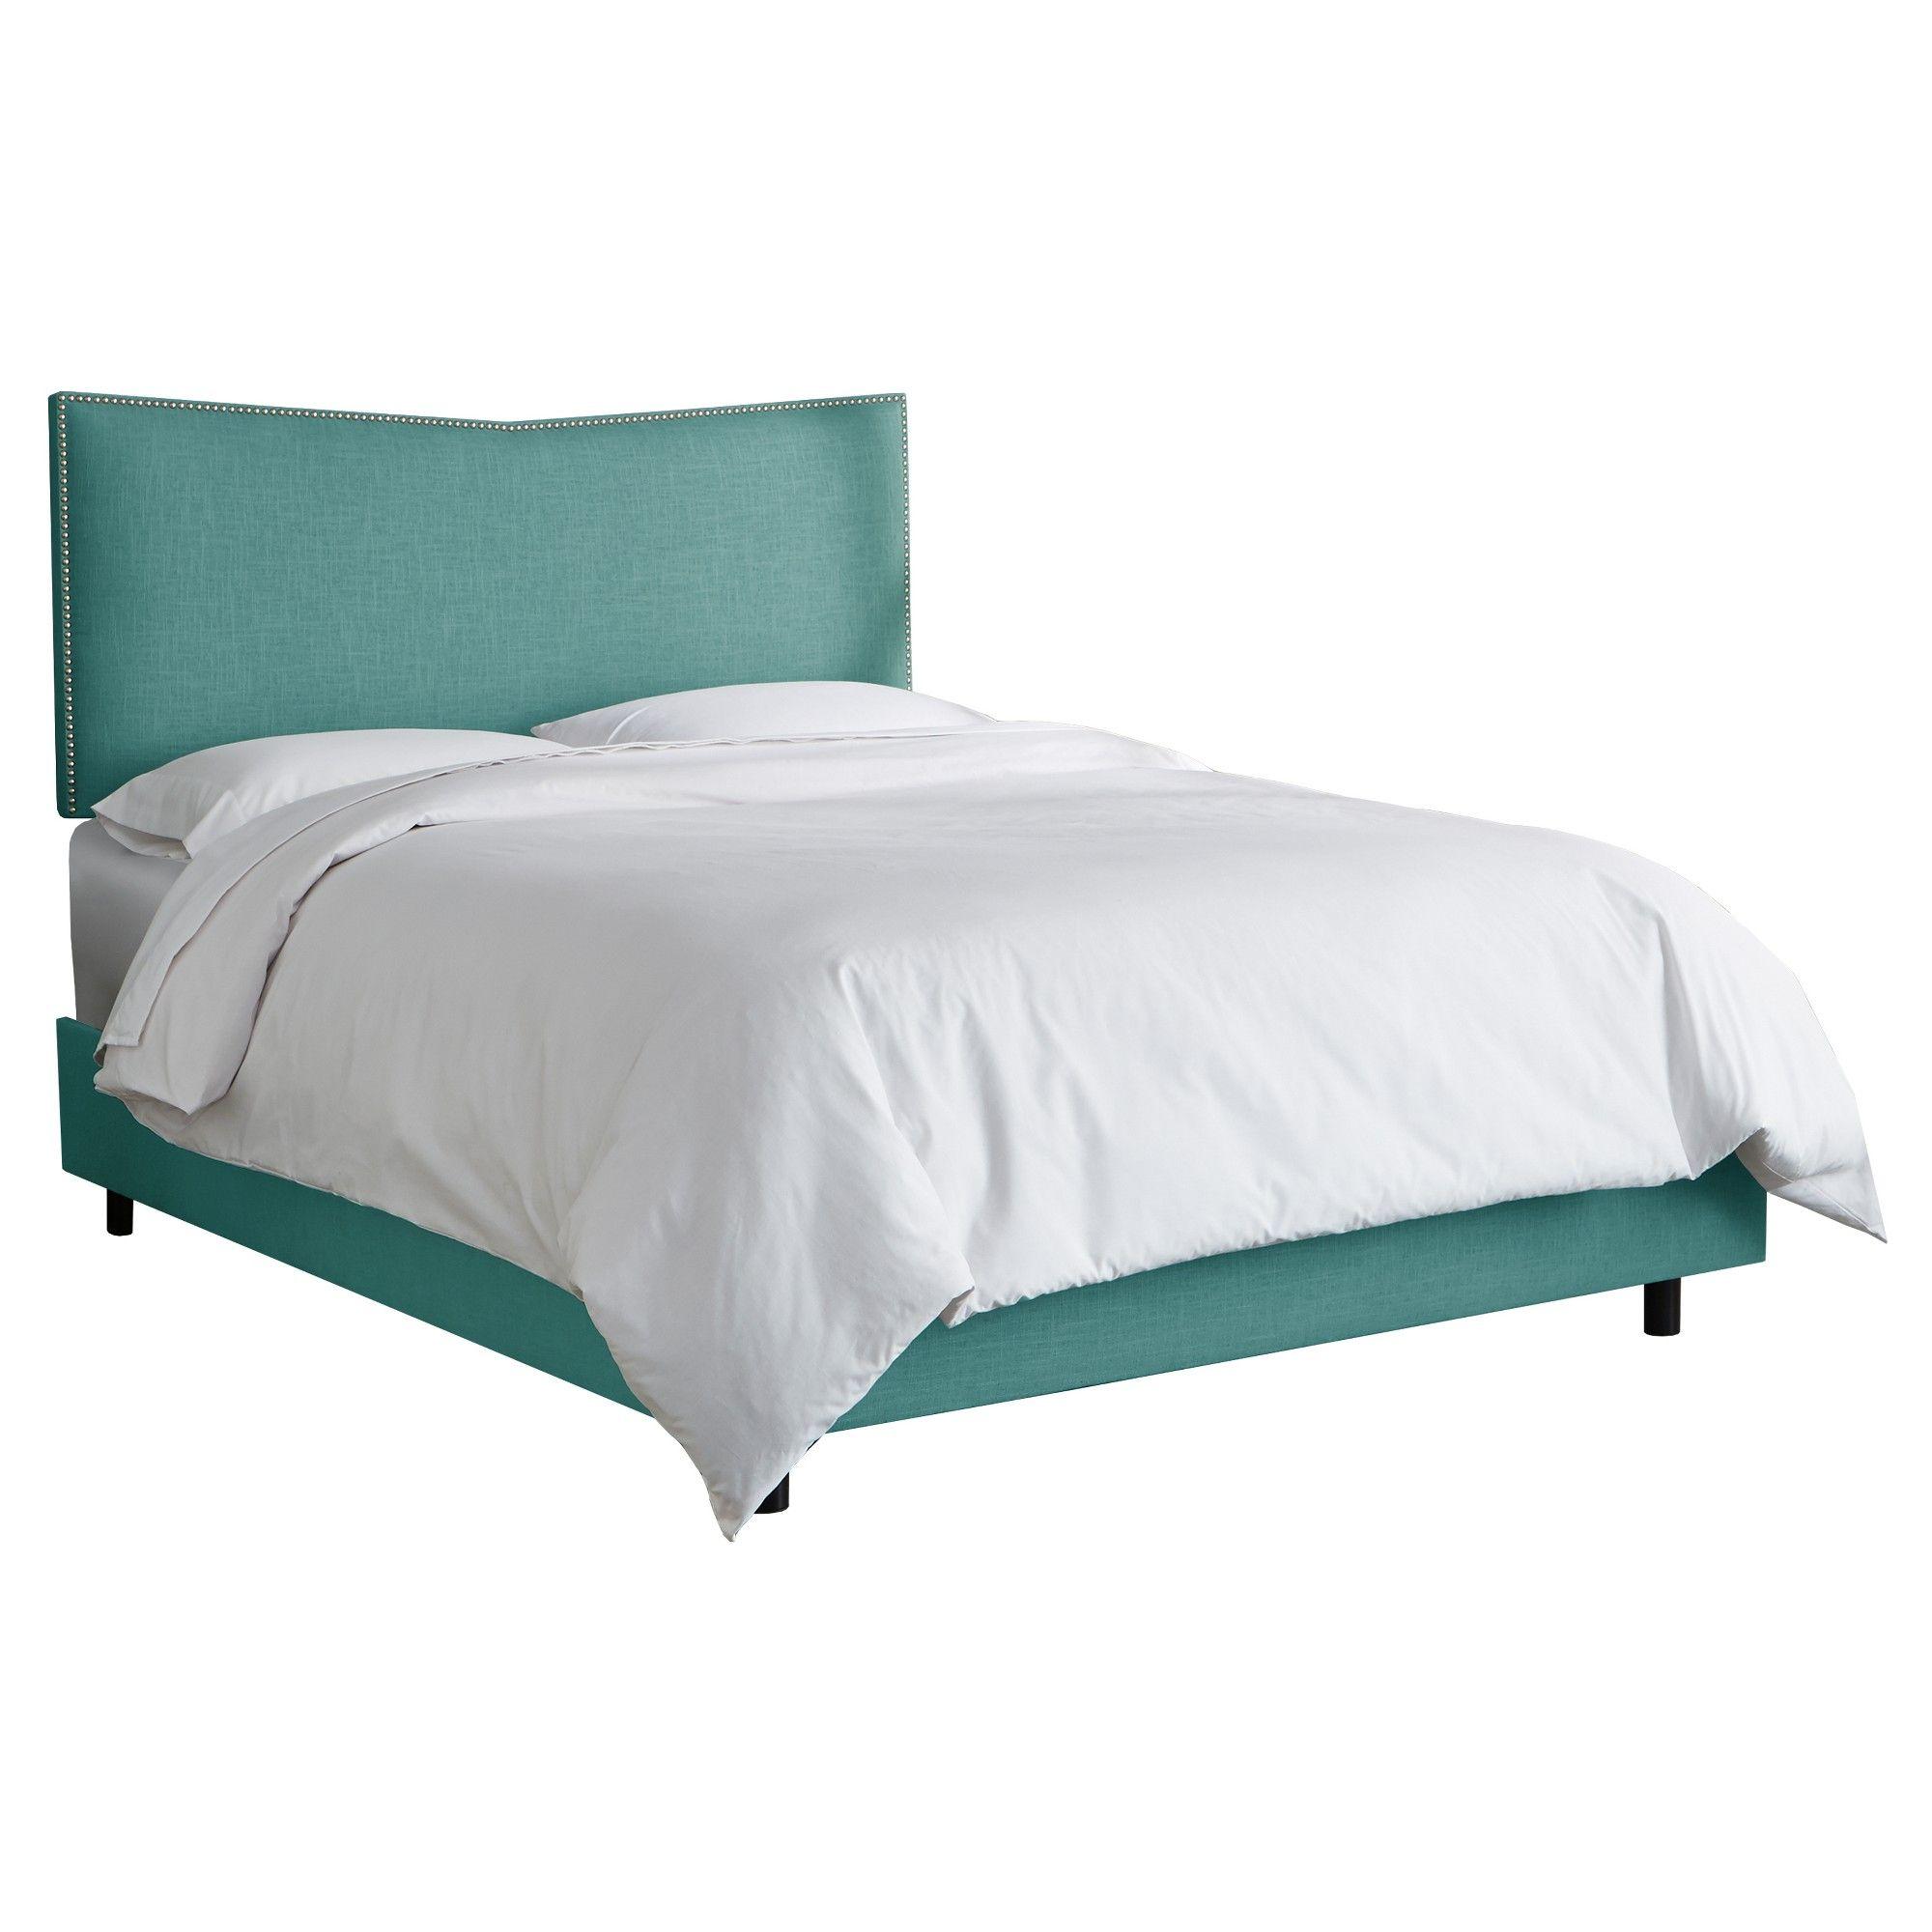 Avery Upholstered Nail button Bed - California King - Laguna Linen - Skyline Furniture